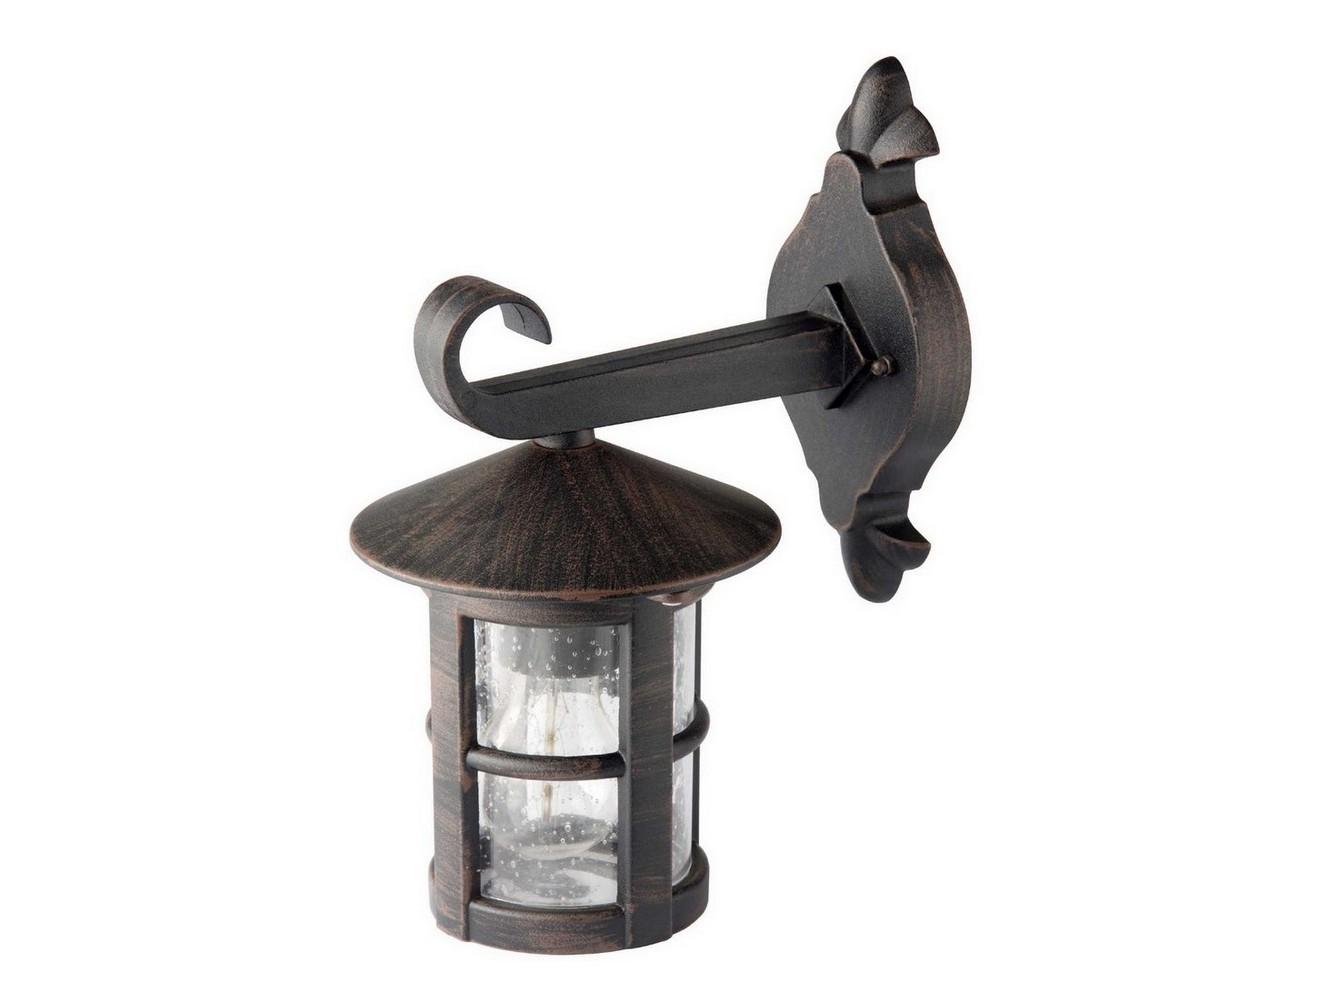 Светильник настенный JordyУличные настенные светильники<br>&amp;lt;div&amp;gt;Вид цоколя: Е27&amp;lt;/div&amp;gt;&amp;lt;div&amp;gt;Мощность лампы: 60W&amp;lt;/div&amp;gt;&amp;lt;div&amp;gt;Количество ламп: 1&amp;lt;/div&amp;gt;&amp;lt;div&amp;gt;Наличие ламп: нет&amp;lt;/div&amp;gt;<br><br>Material: Стекло<br>Width см: 15<br>Depth см: 23<br>Height см: 30